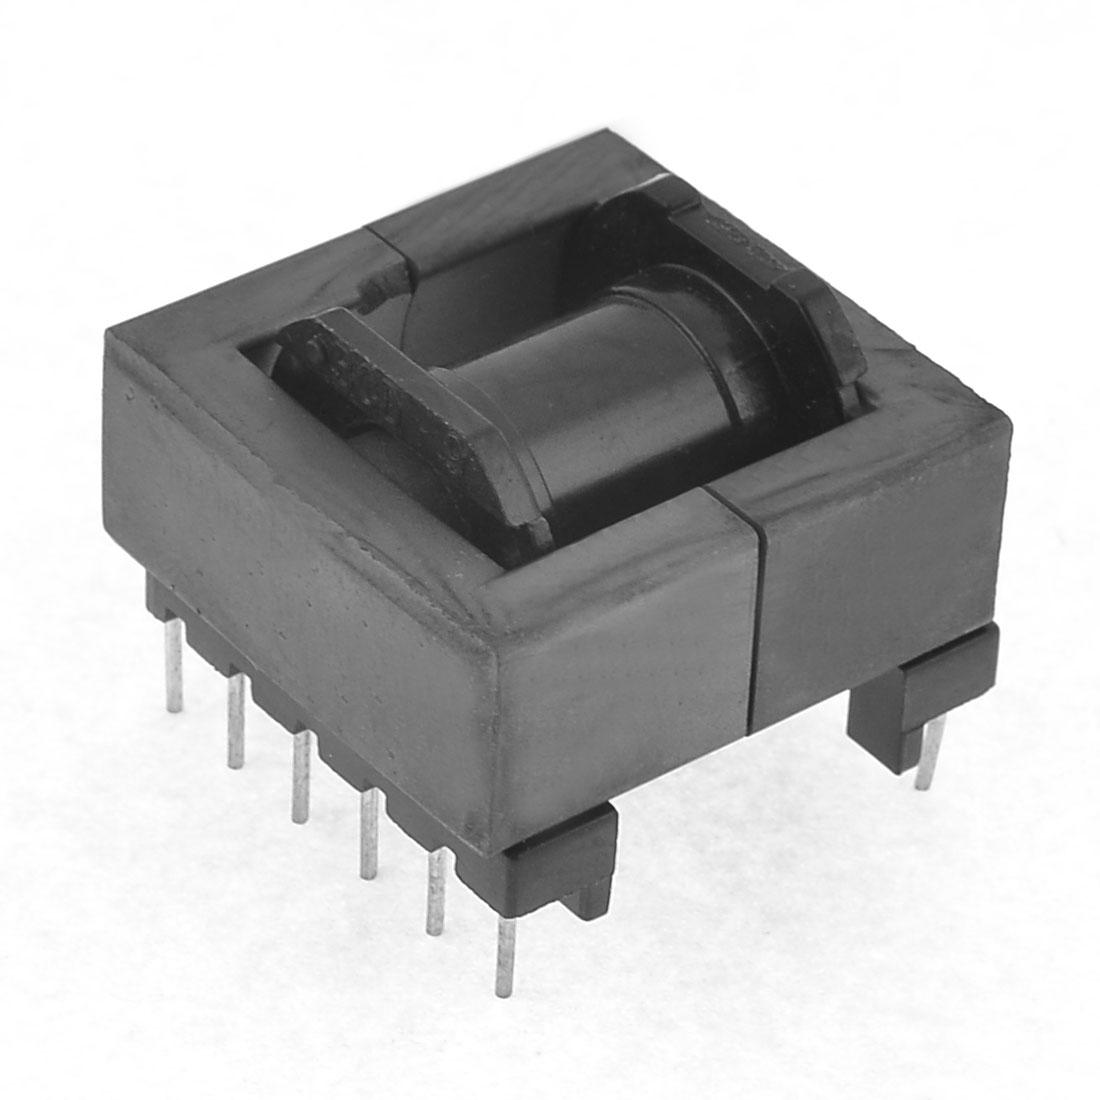 ER28128-EE-Type-Transformer-Ferrite-Magnetic-Core-Coil-Former